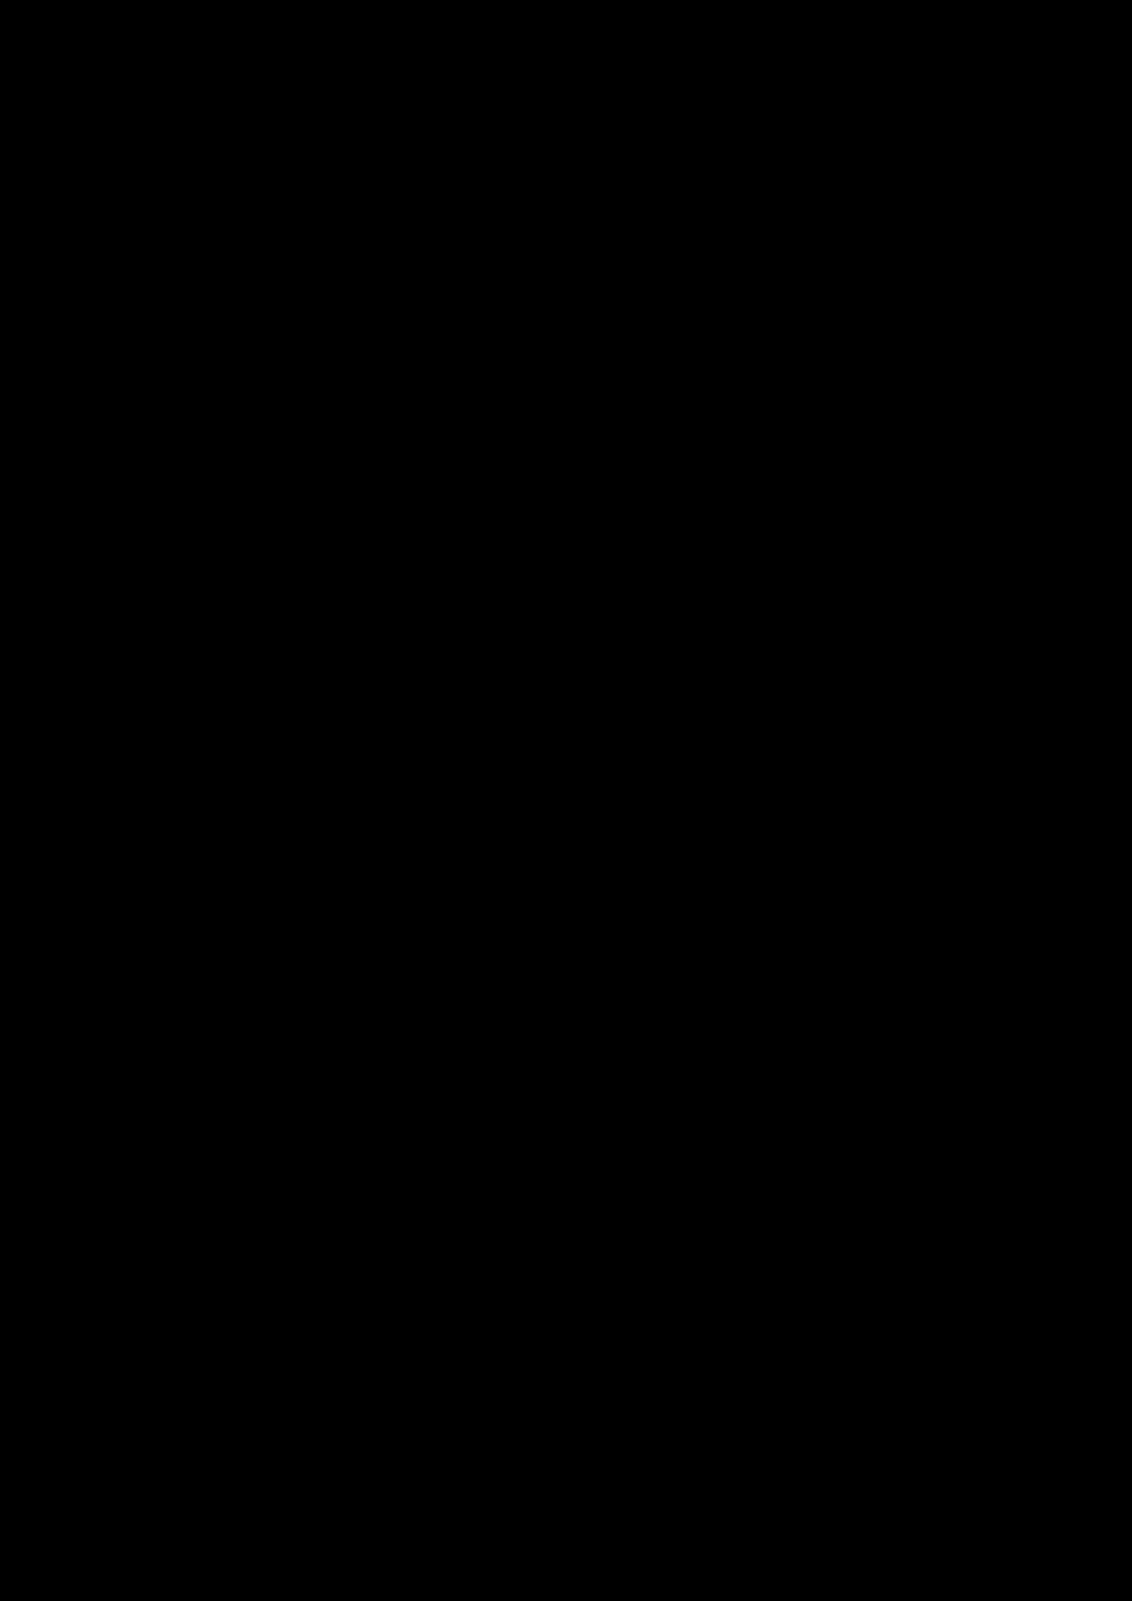 Okean Pustotyi slide, Image 39